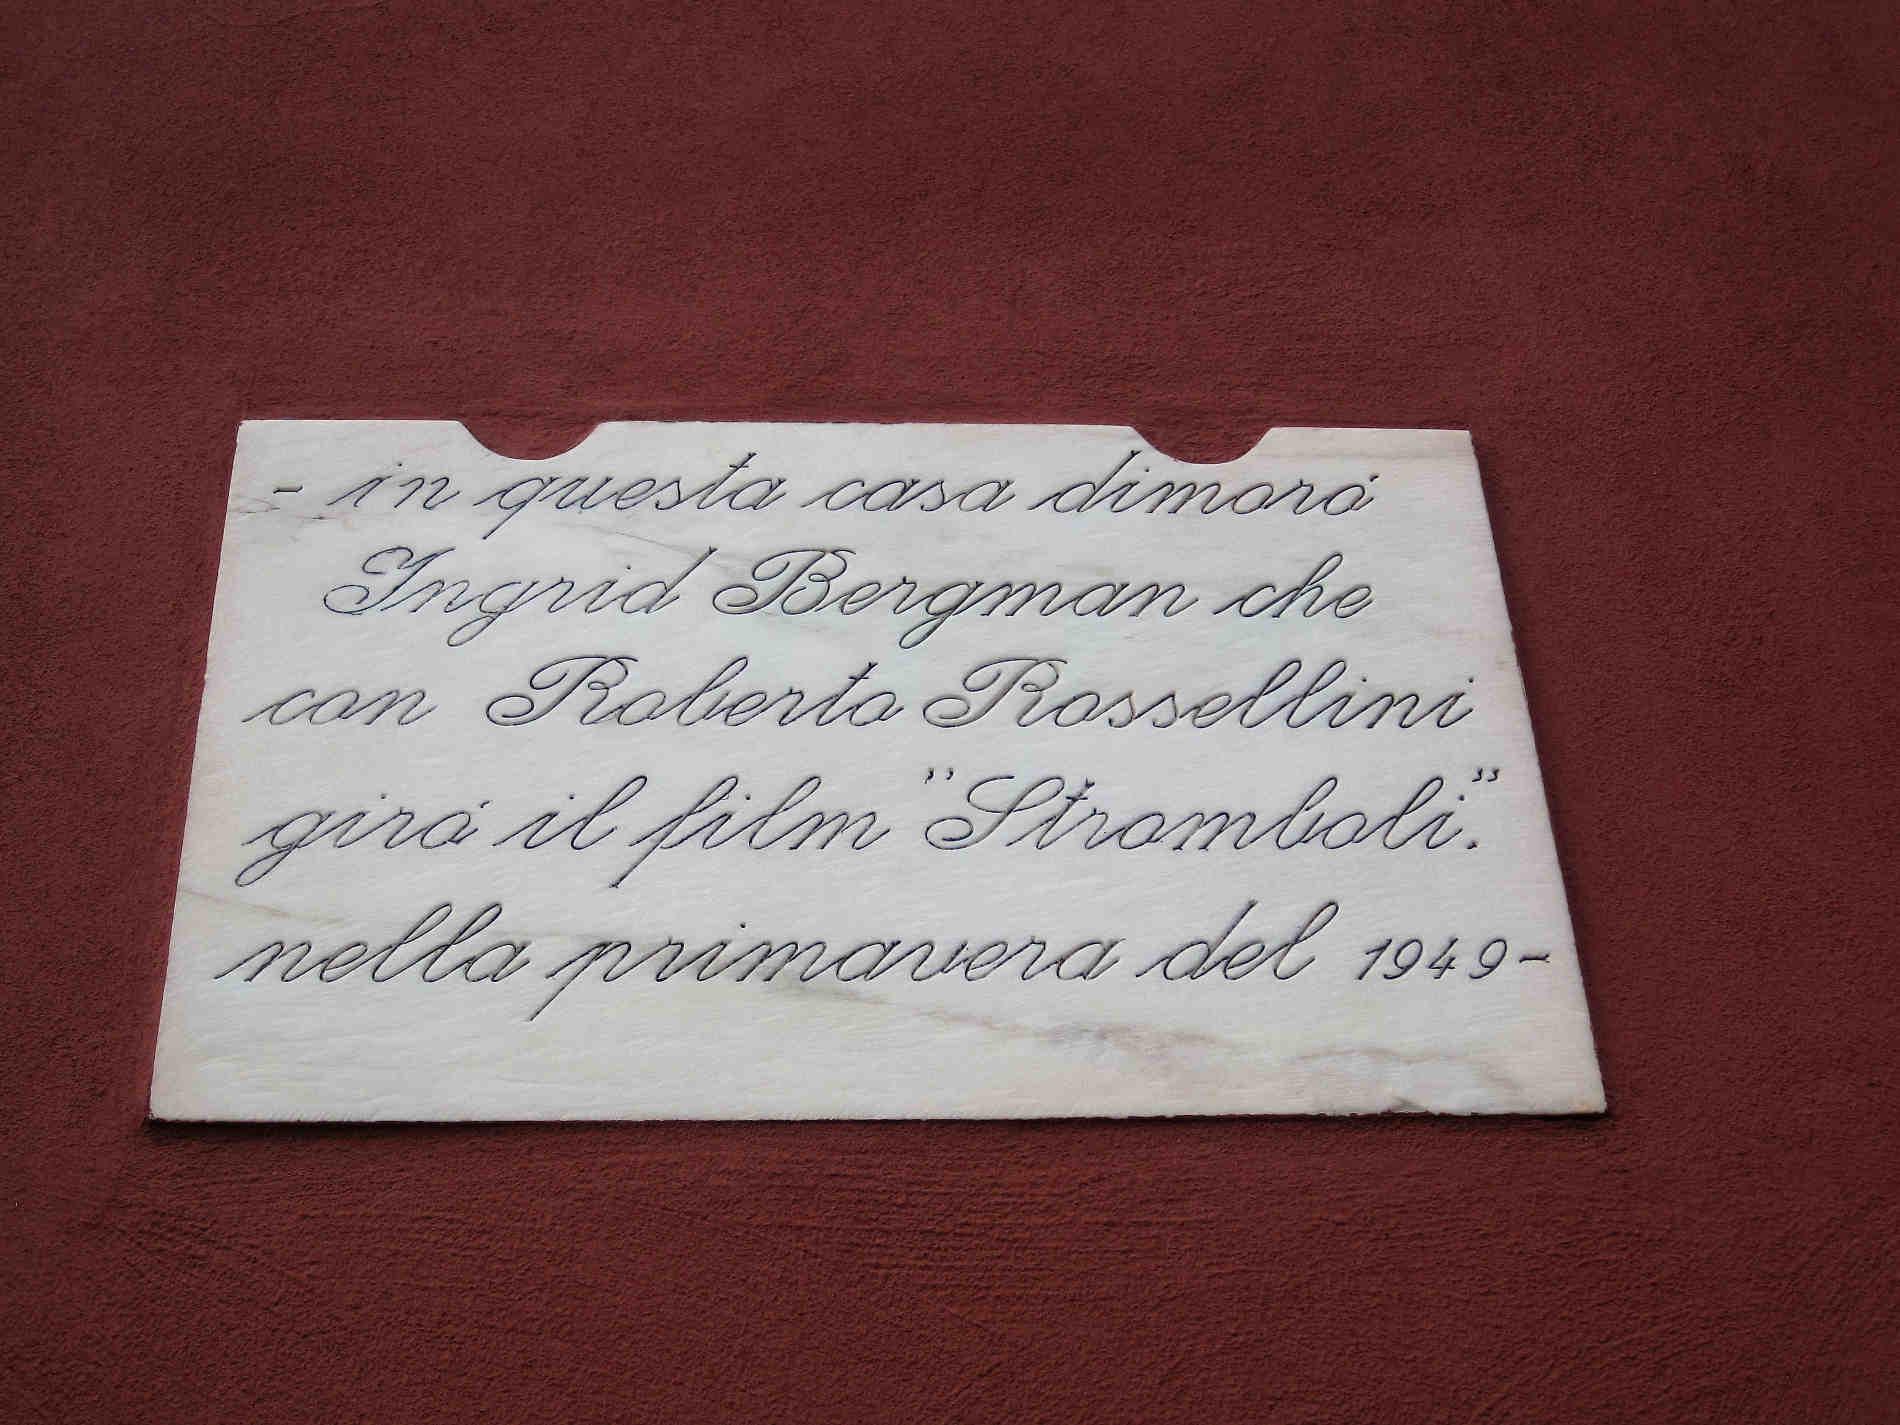 Casa Rosa di Rossellini e Bergman a Stromboli Isole Eolie